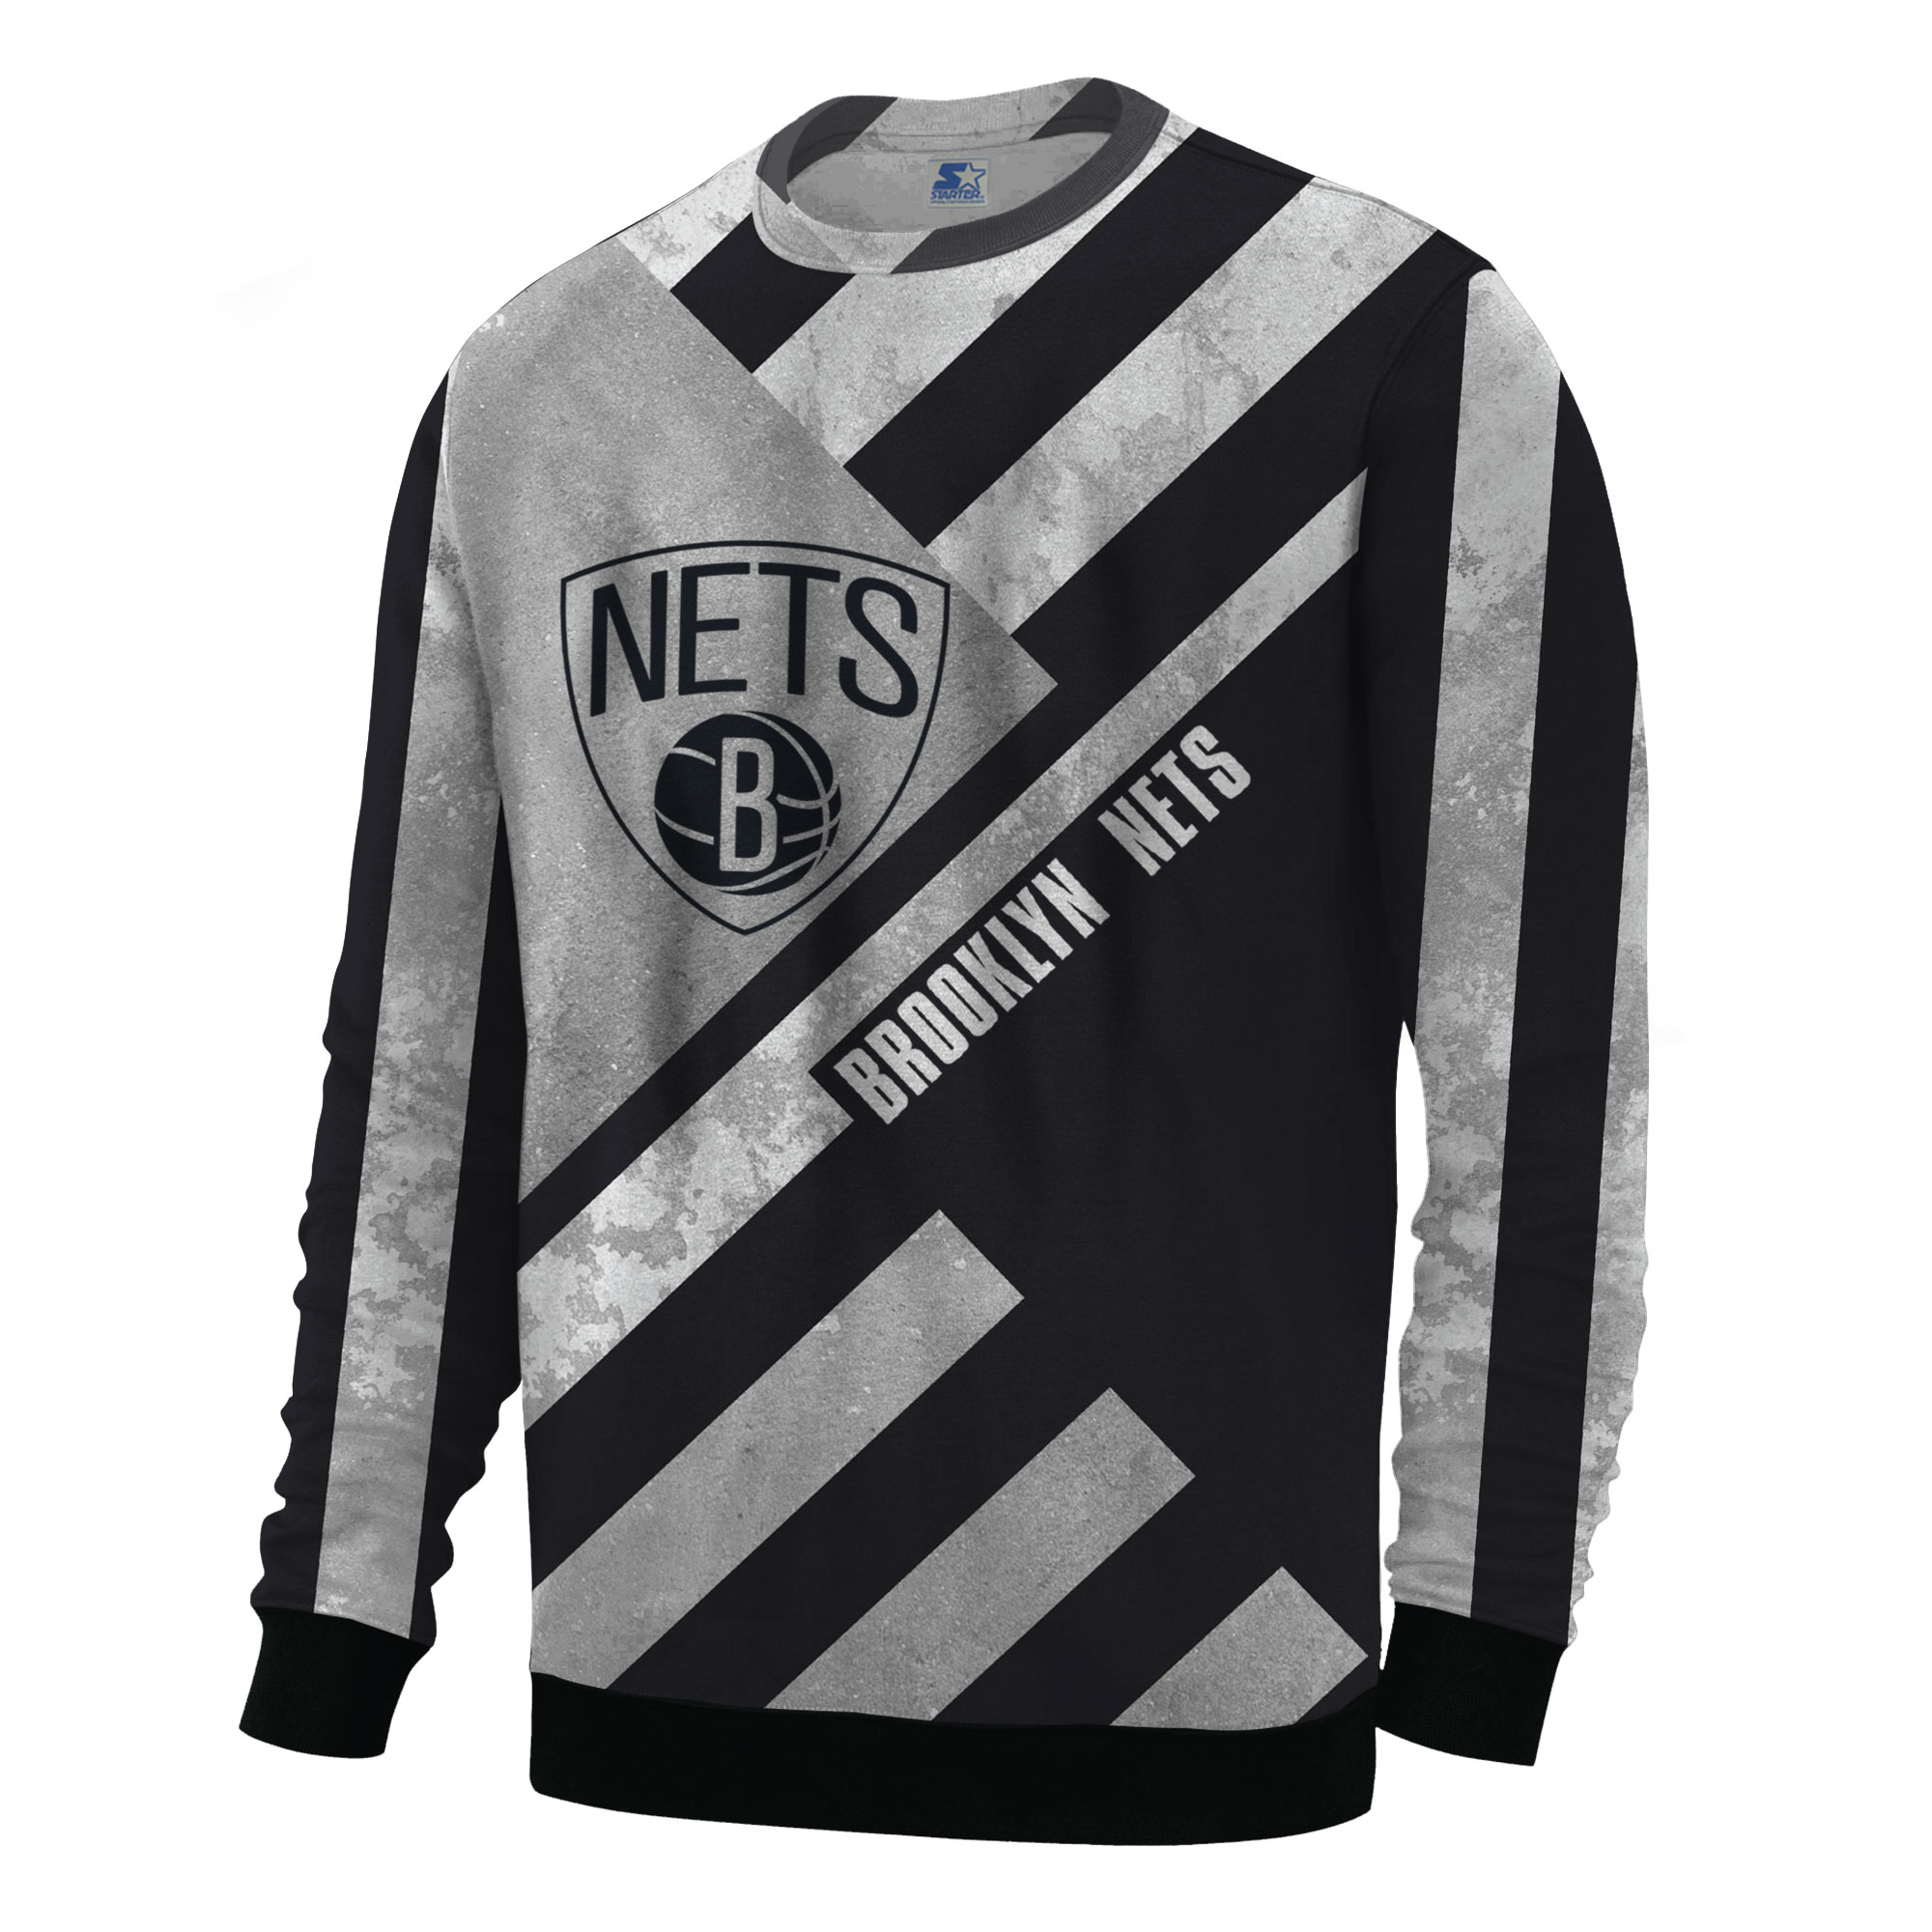 Brooklyn Nets 3D Basic (BSC-3D-1035)